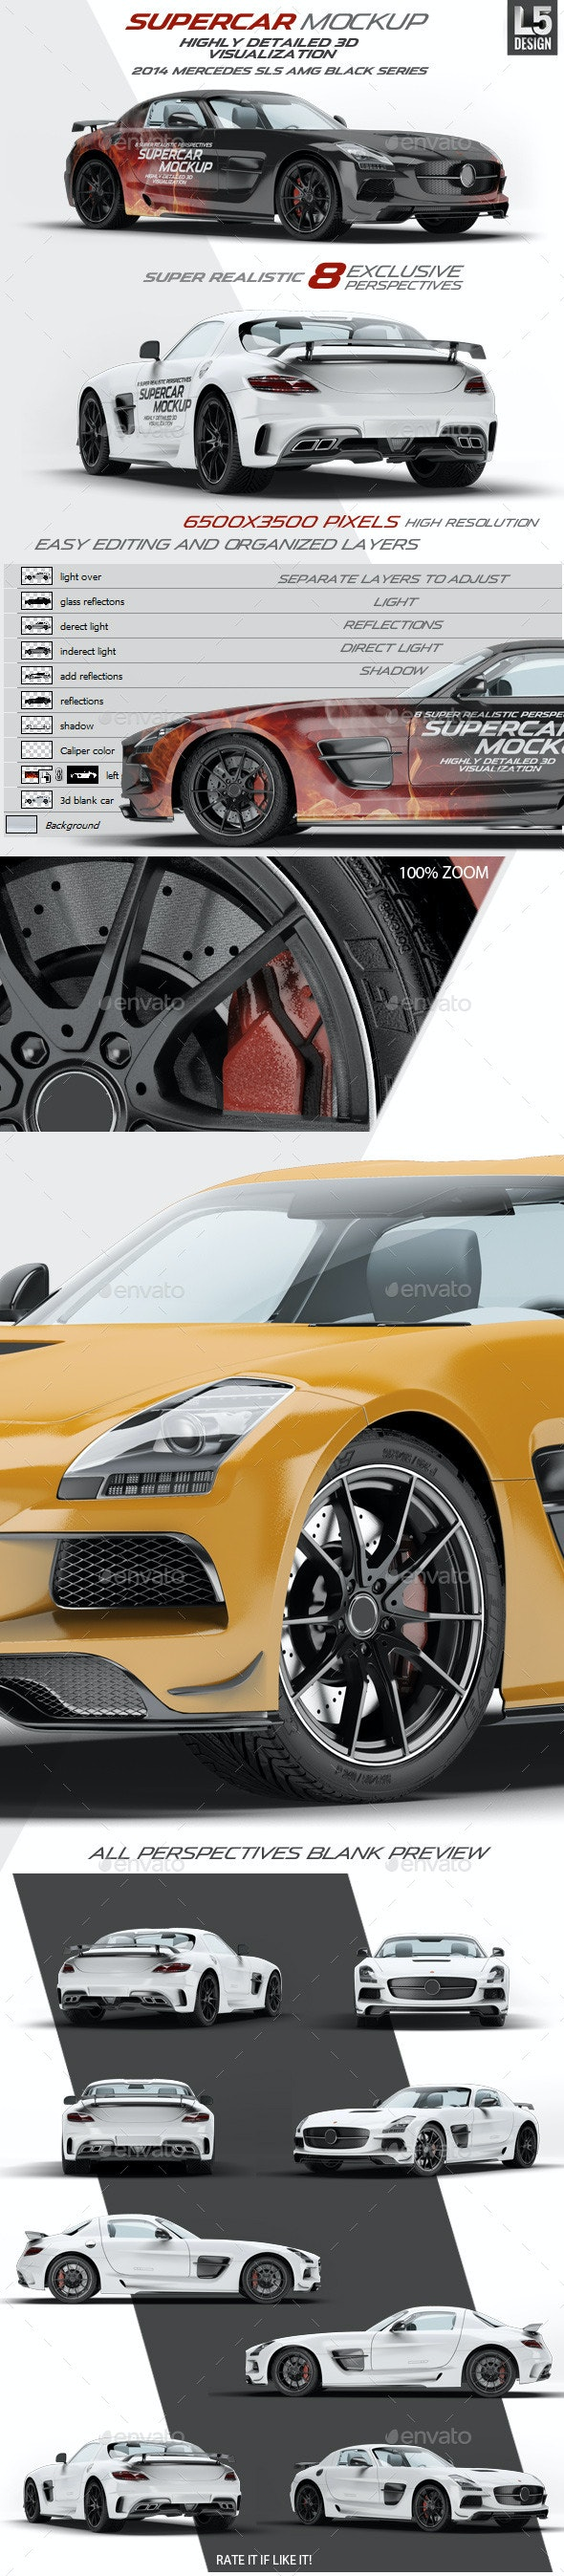 Supercar Mercedes SLS AMG Mock-Up - Vehicle Wraps Print